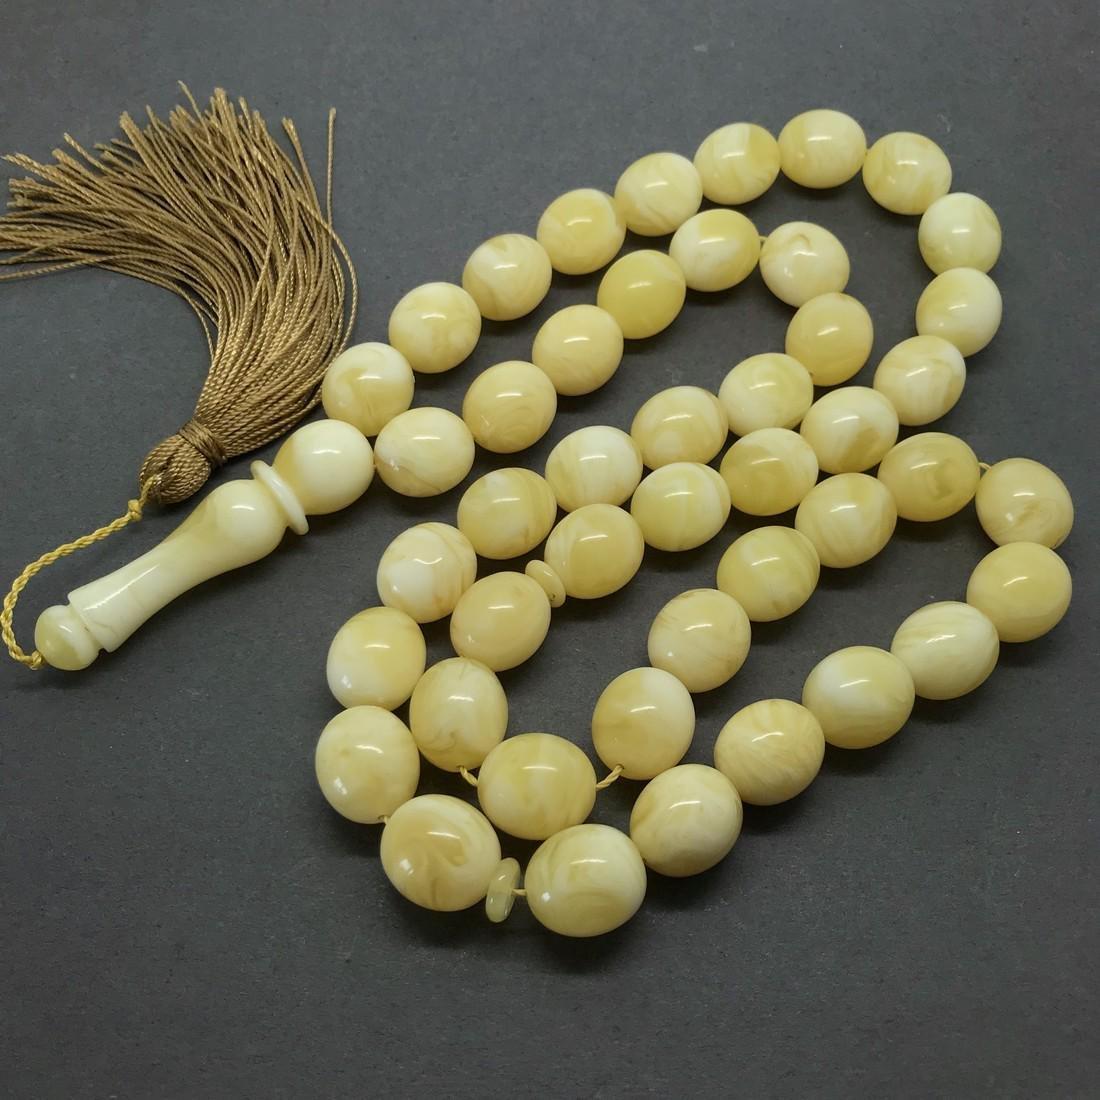 Baltic amber tesbih misbaha beads rosary